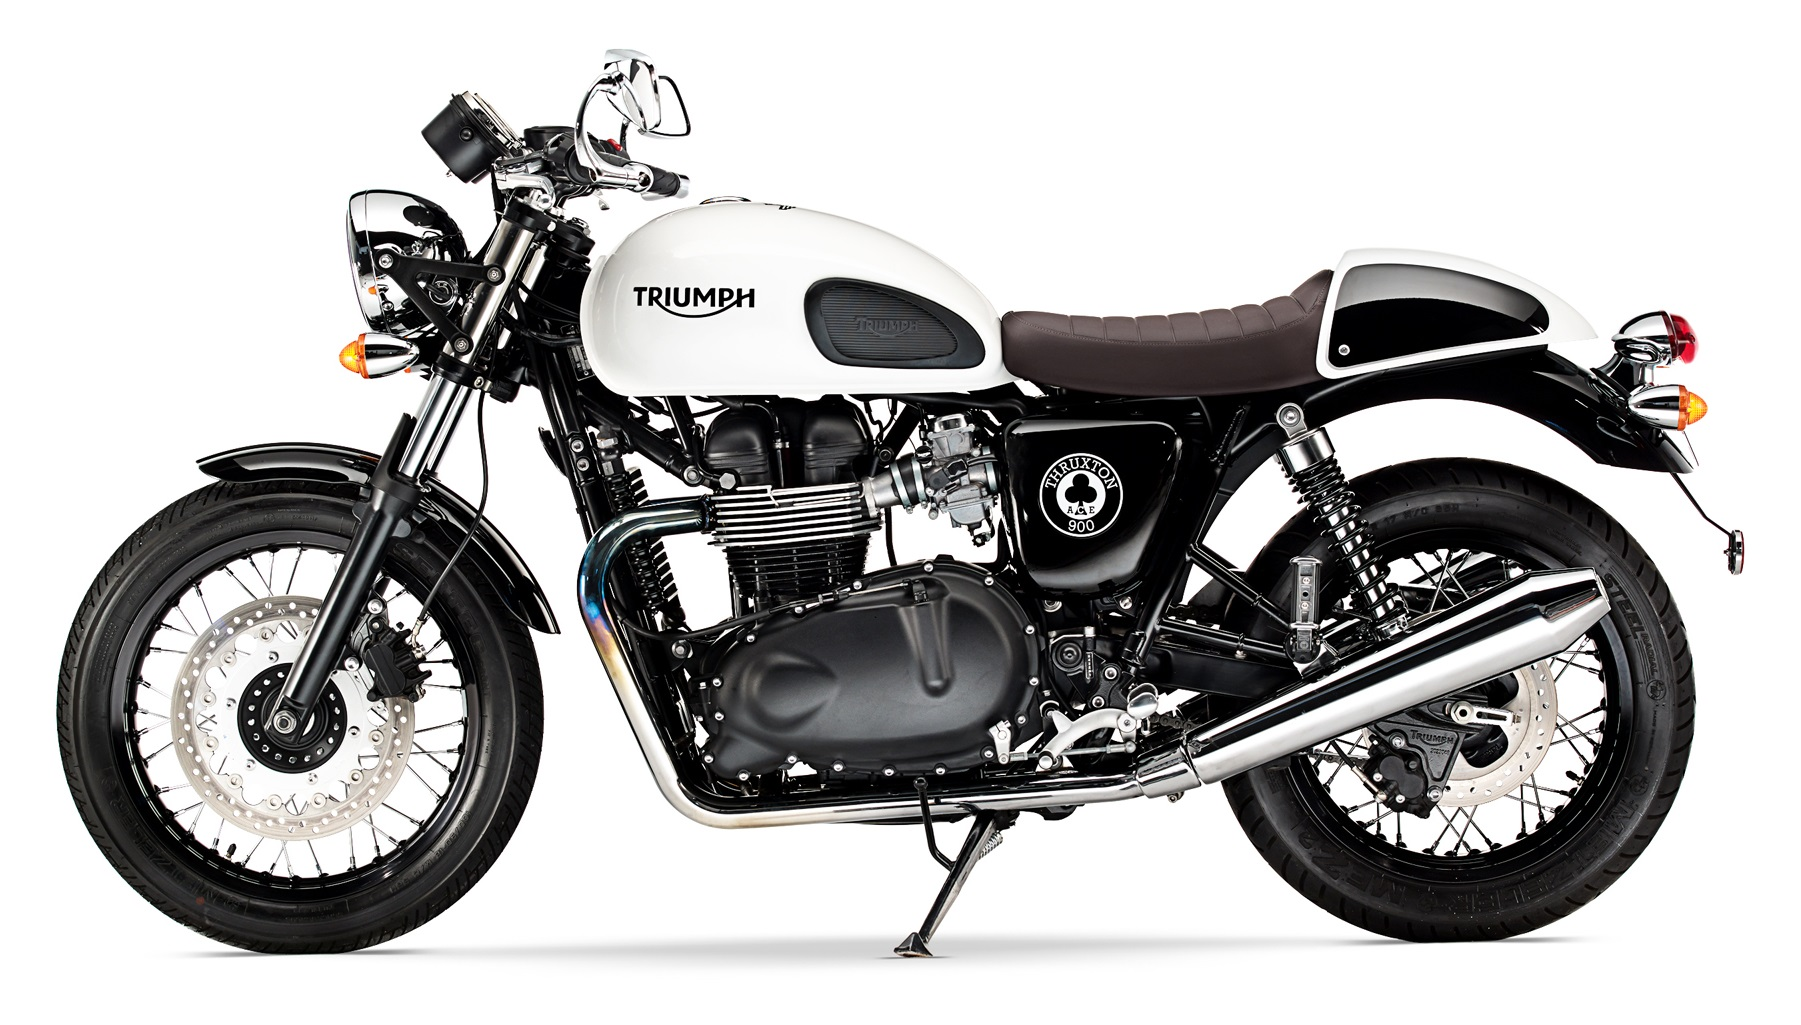 For Sale: Triumph Thruxton 900 • The Bike Market